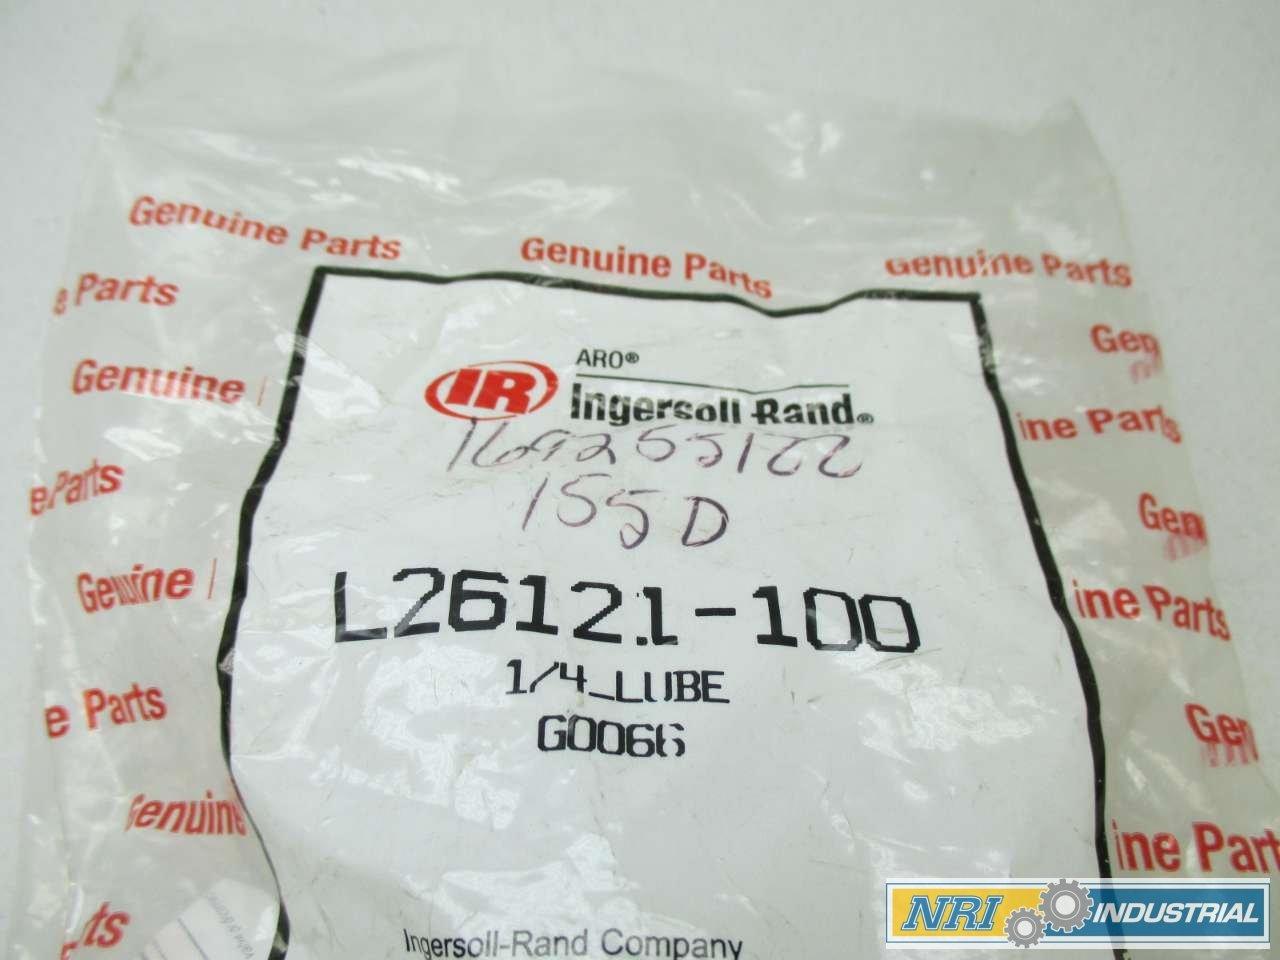 NEW INGERSOLL RAND L26121-100 200PSI 1//4 IN NPT PNEUMATIC LUBRICATOR D442959